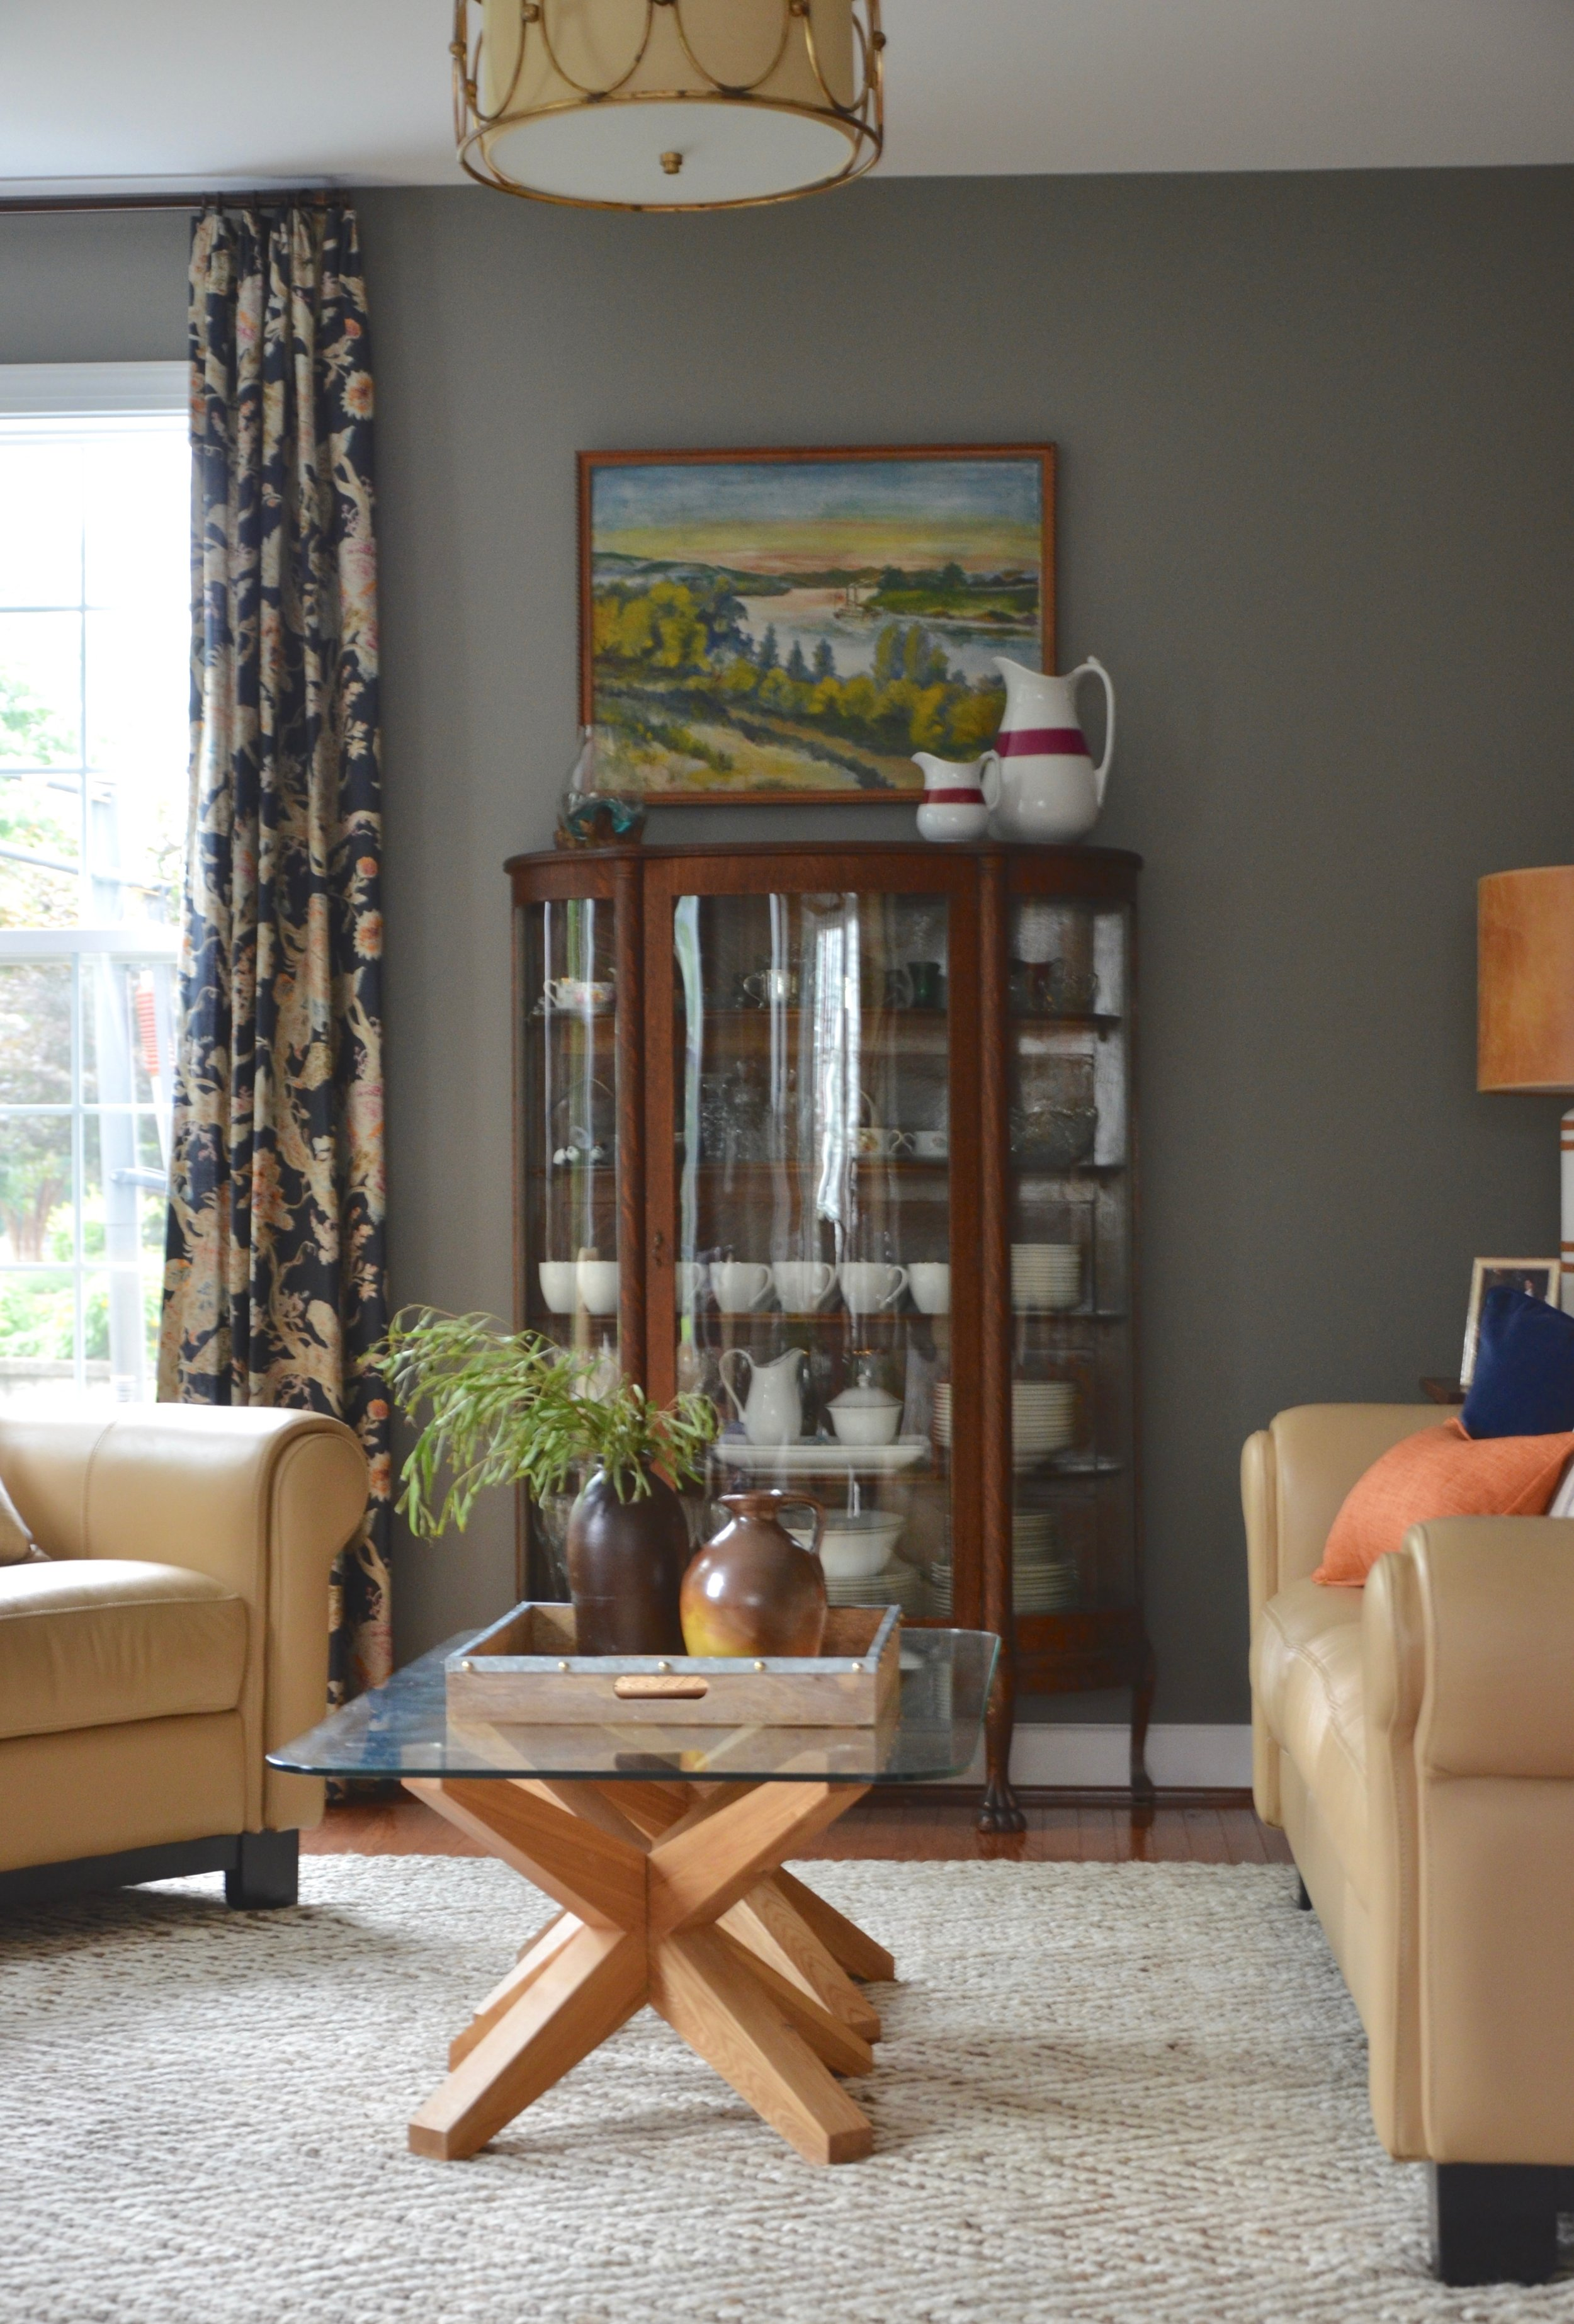 Client First Floor Refresh Living Room in Herndon, Virginia.